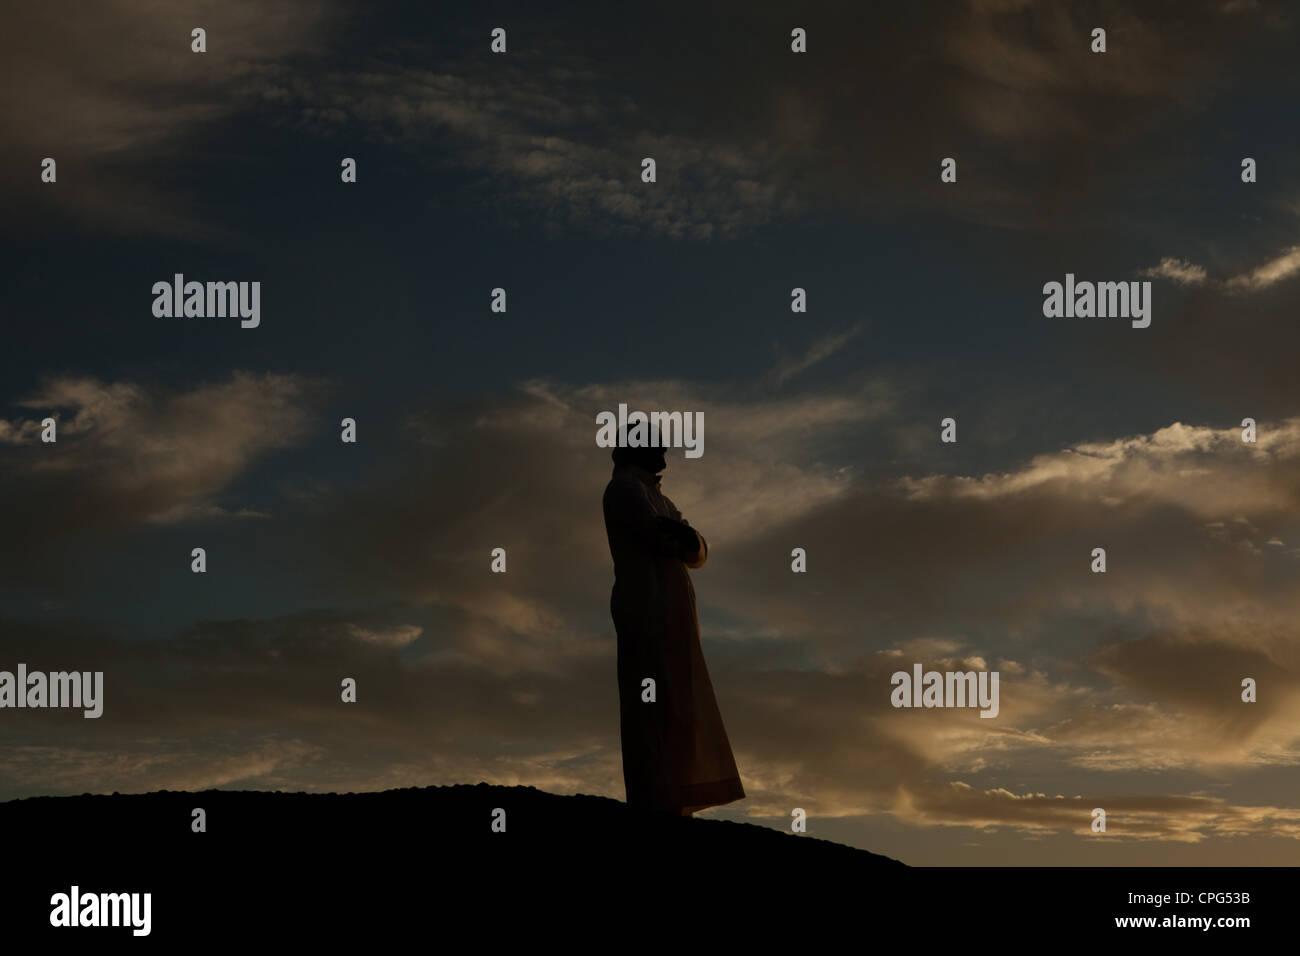 Arab man standing on top of rock, arms crossed. - Stock Image